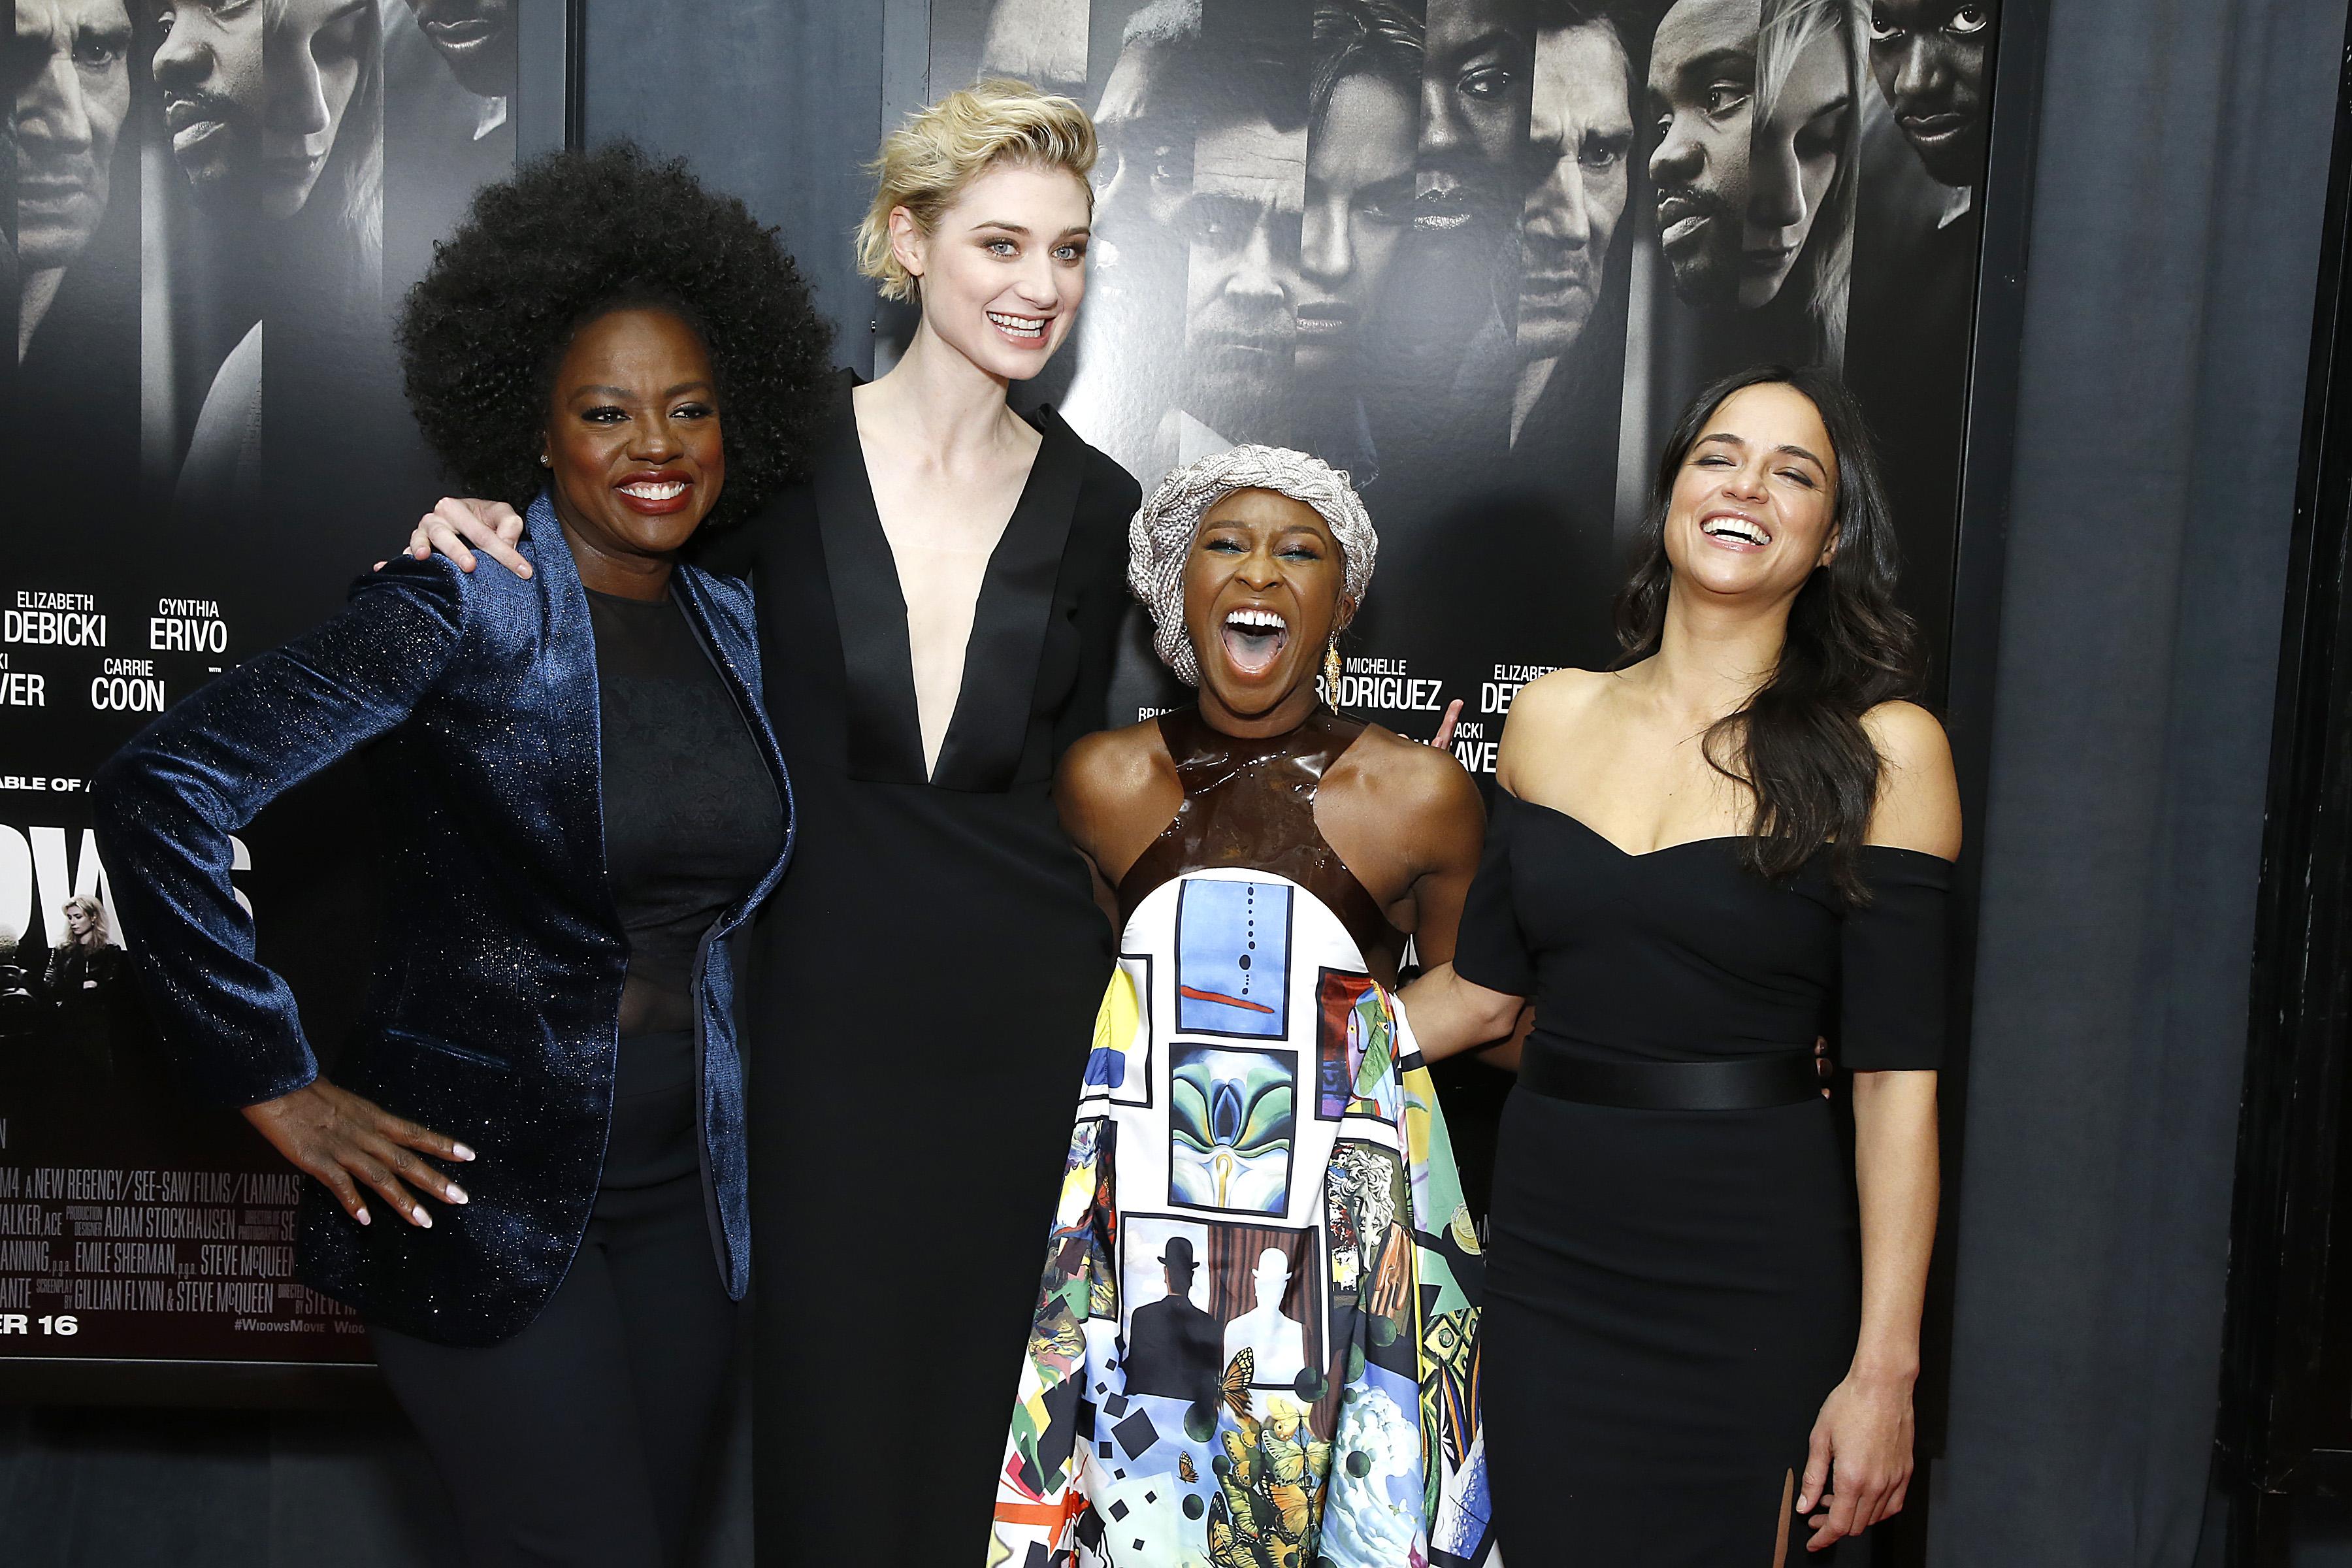 Viola Davis, Elizabeth Debicki, Cynthia Erivo and Michelle Rodriguez